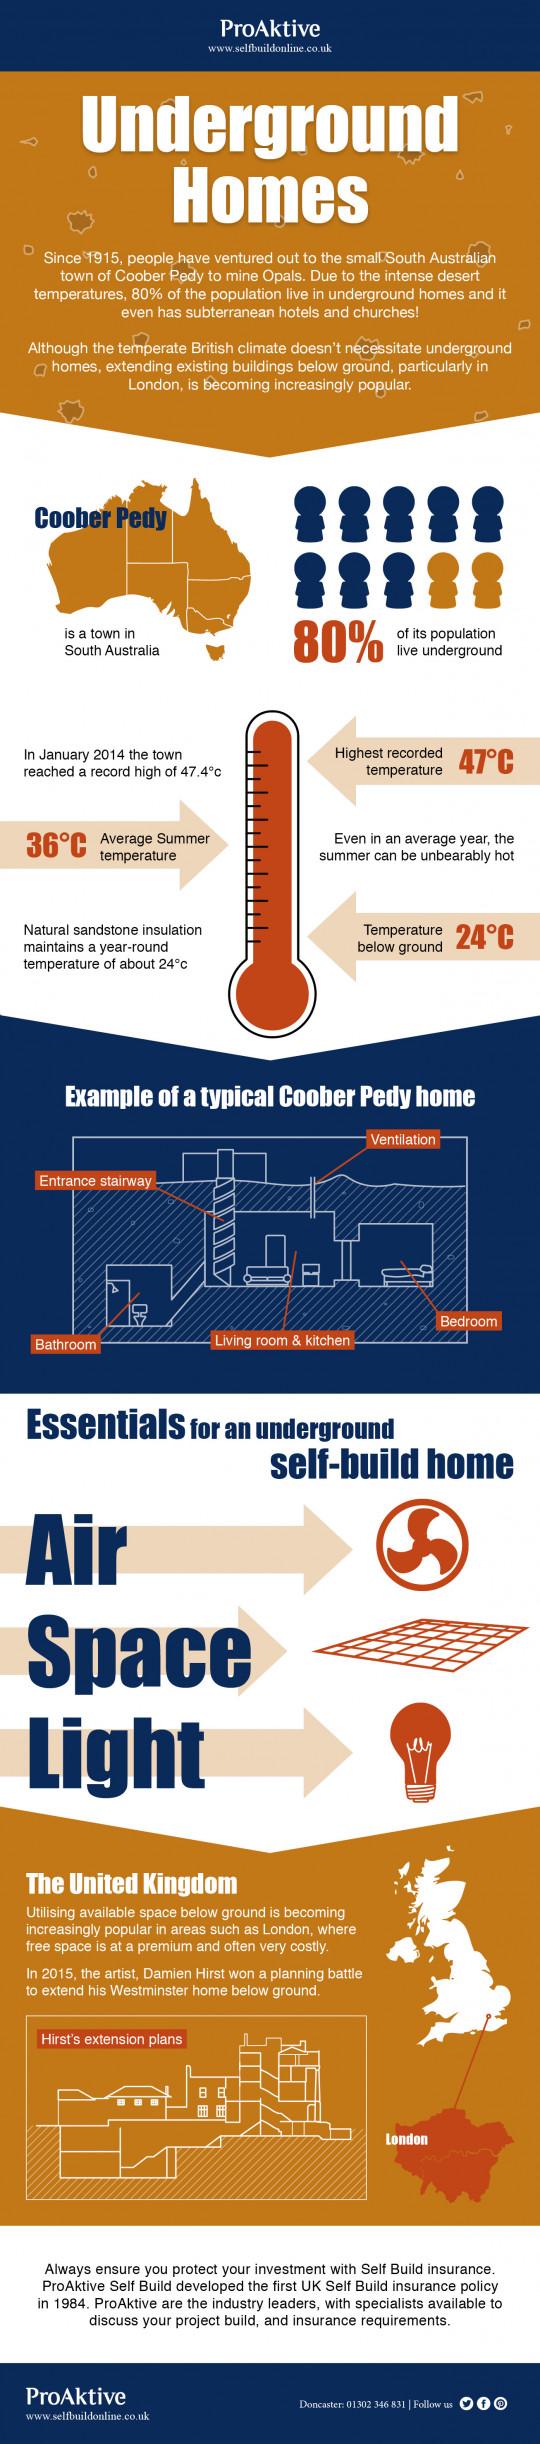 Underground Homes - Self Build Insurance